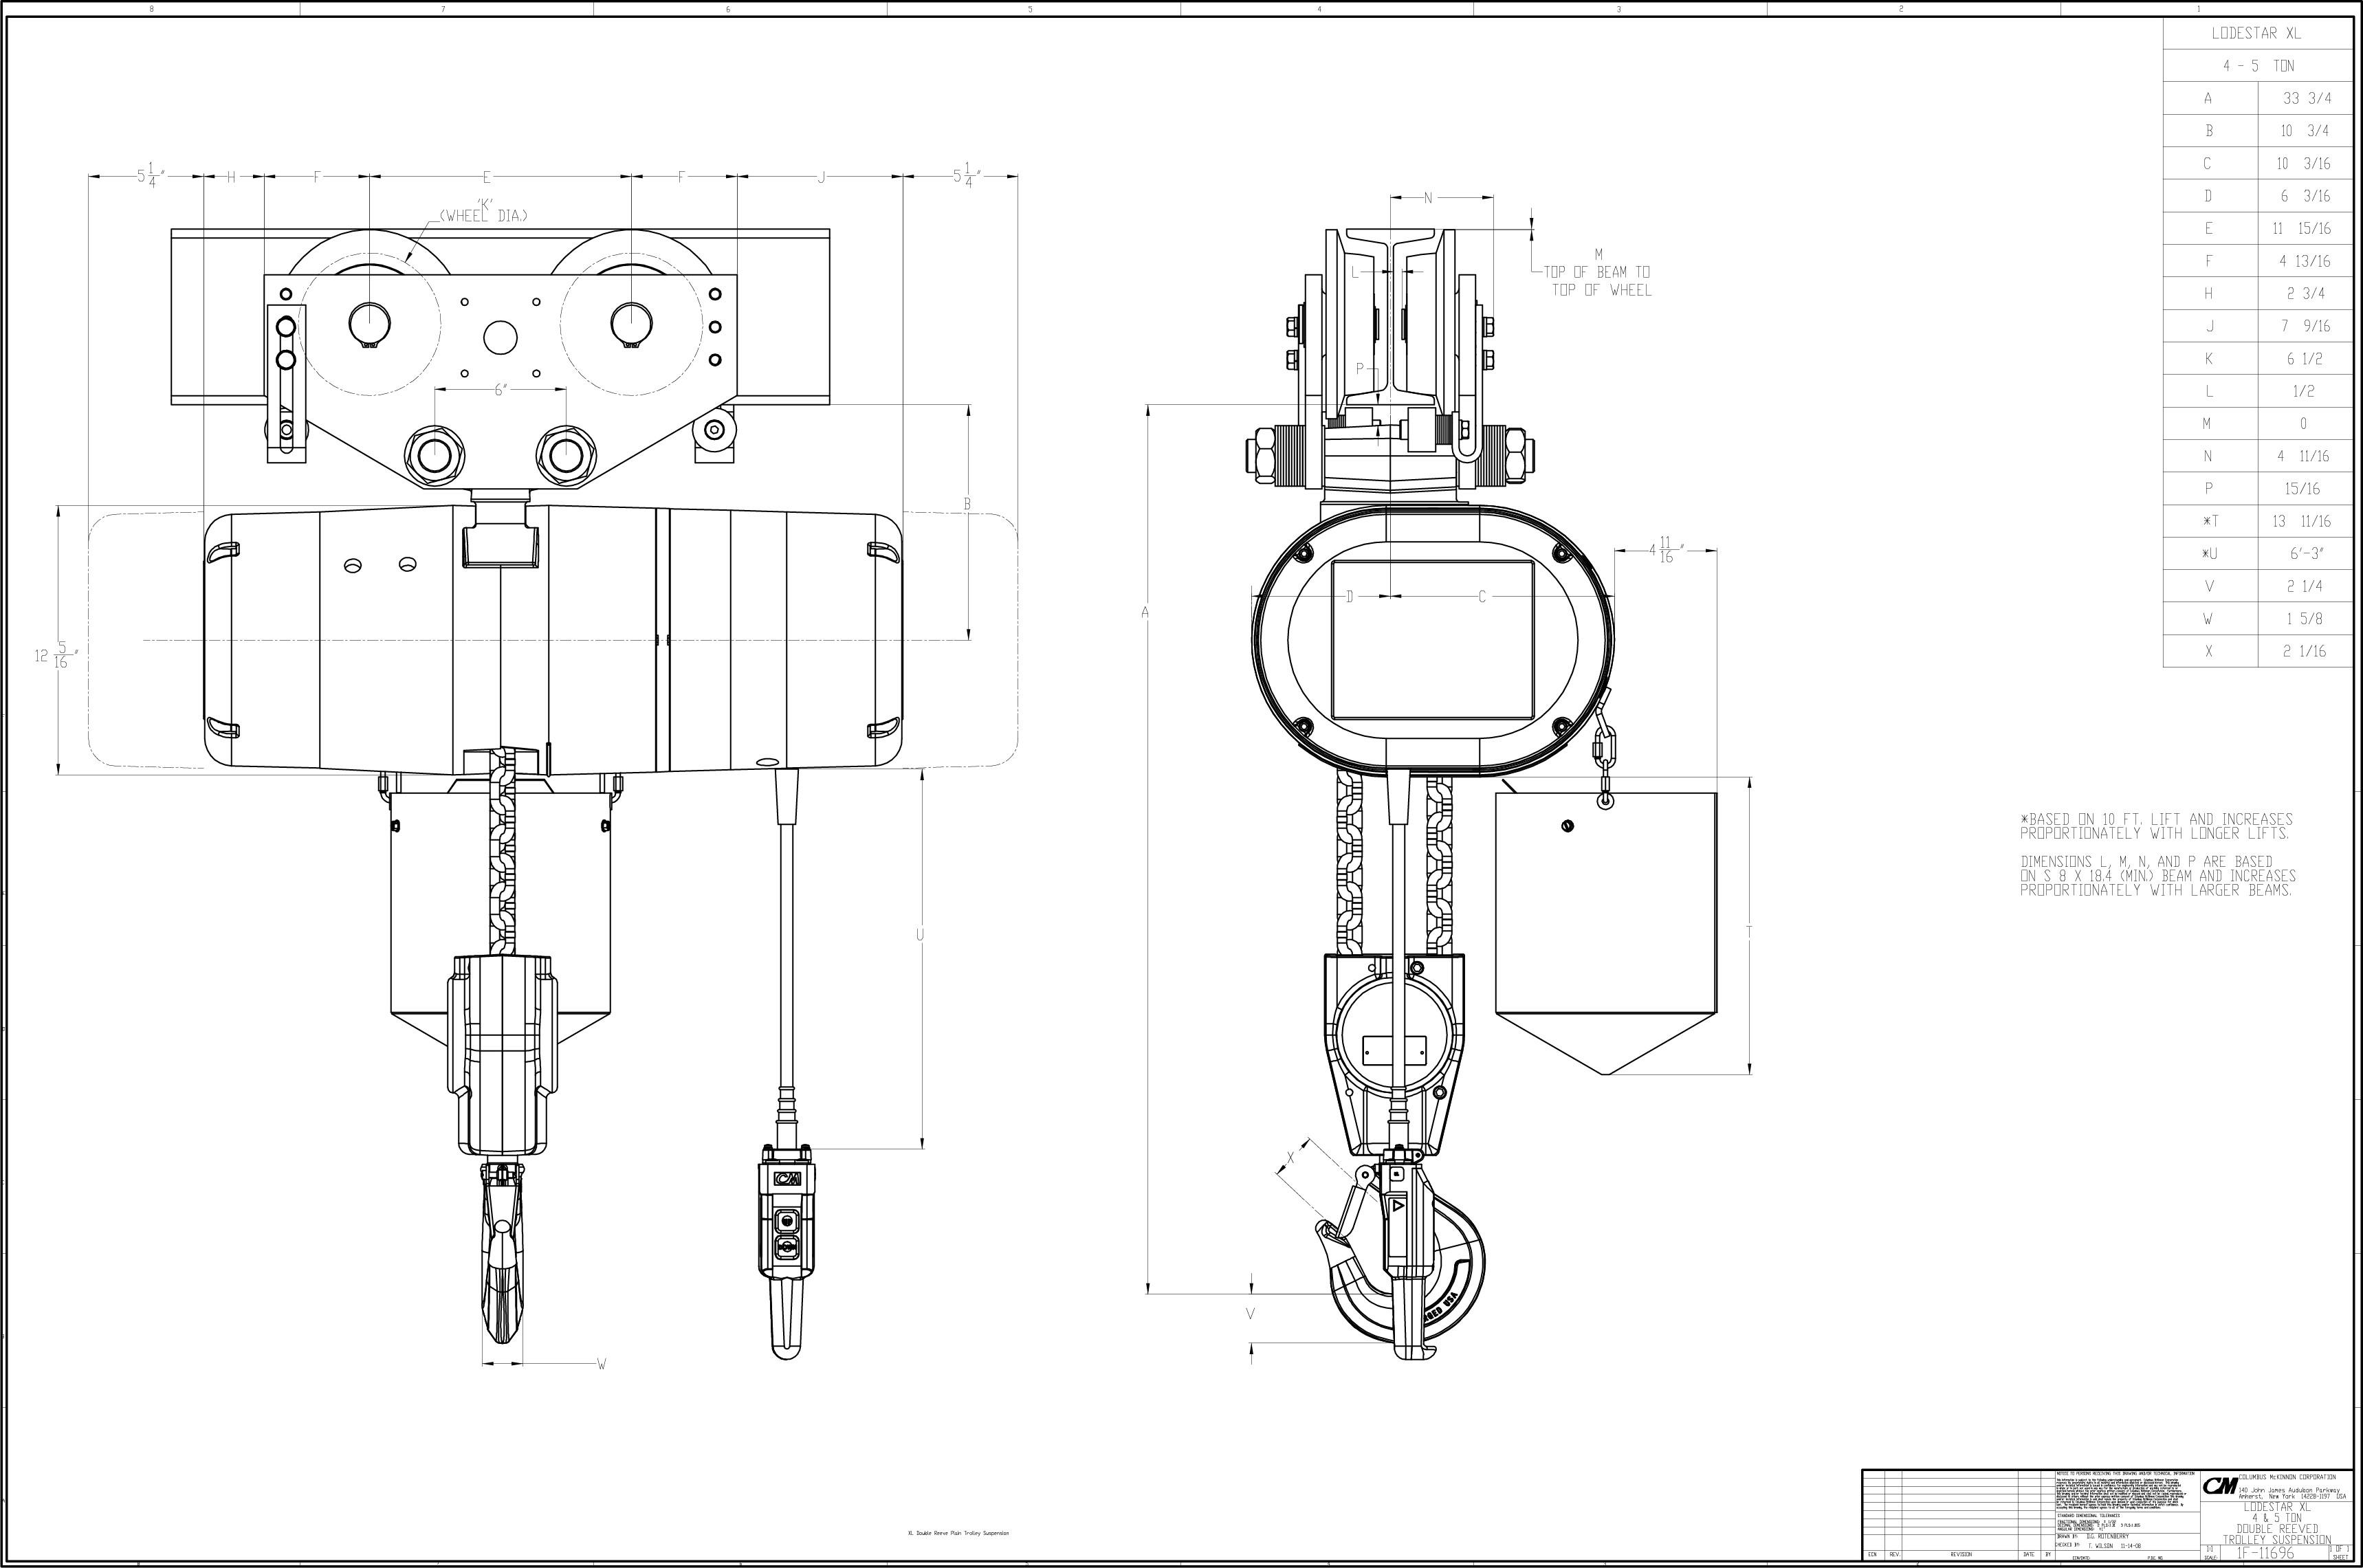 product code 5285p, cm lodestar xl electric chain hoist, 230 460 3product code 5285p, cm lodestar xl electric chain hoist, 230 460 3 60, plain trolley